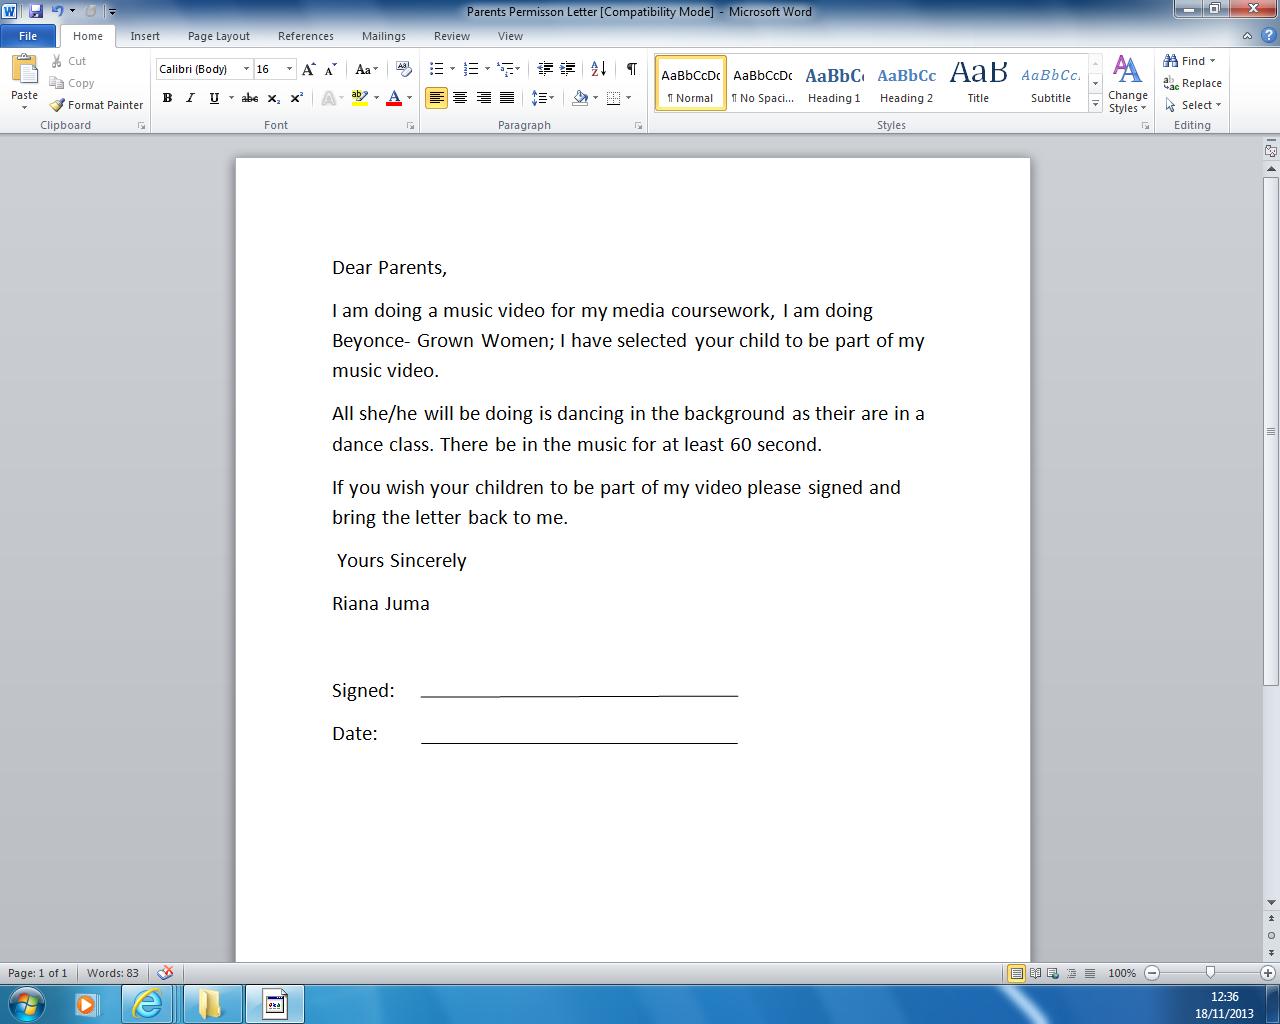 riana juma s a2 media parents permission letter